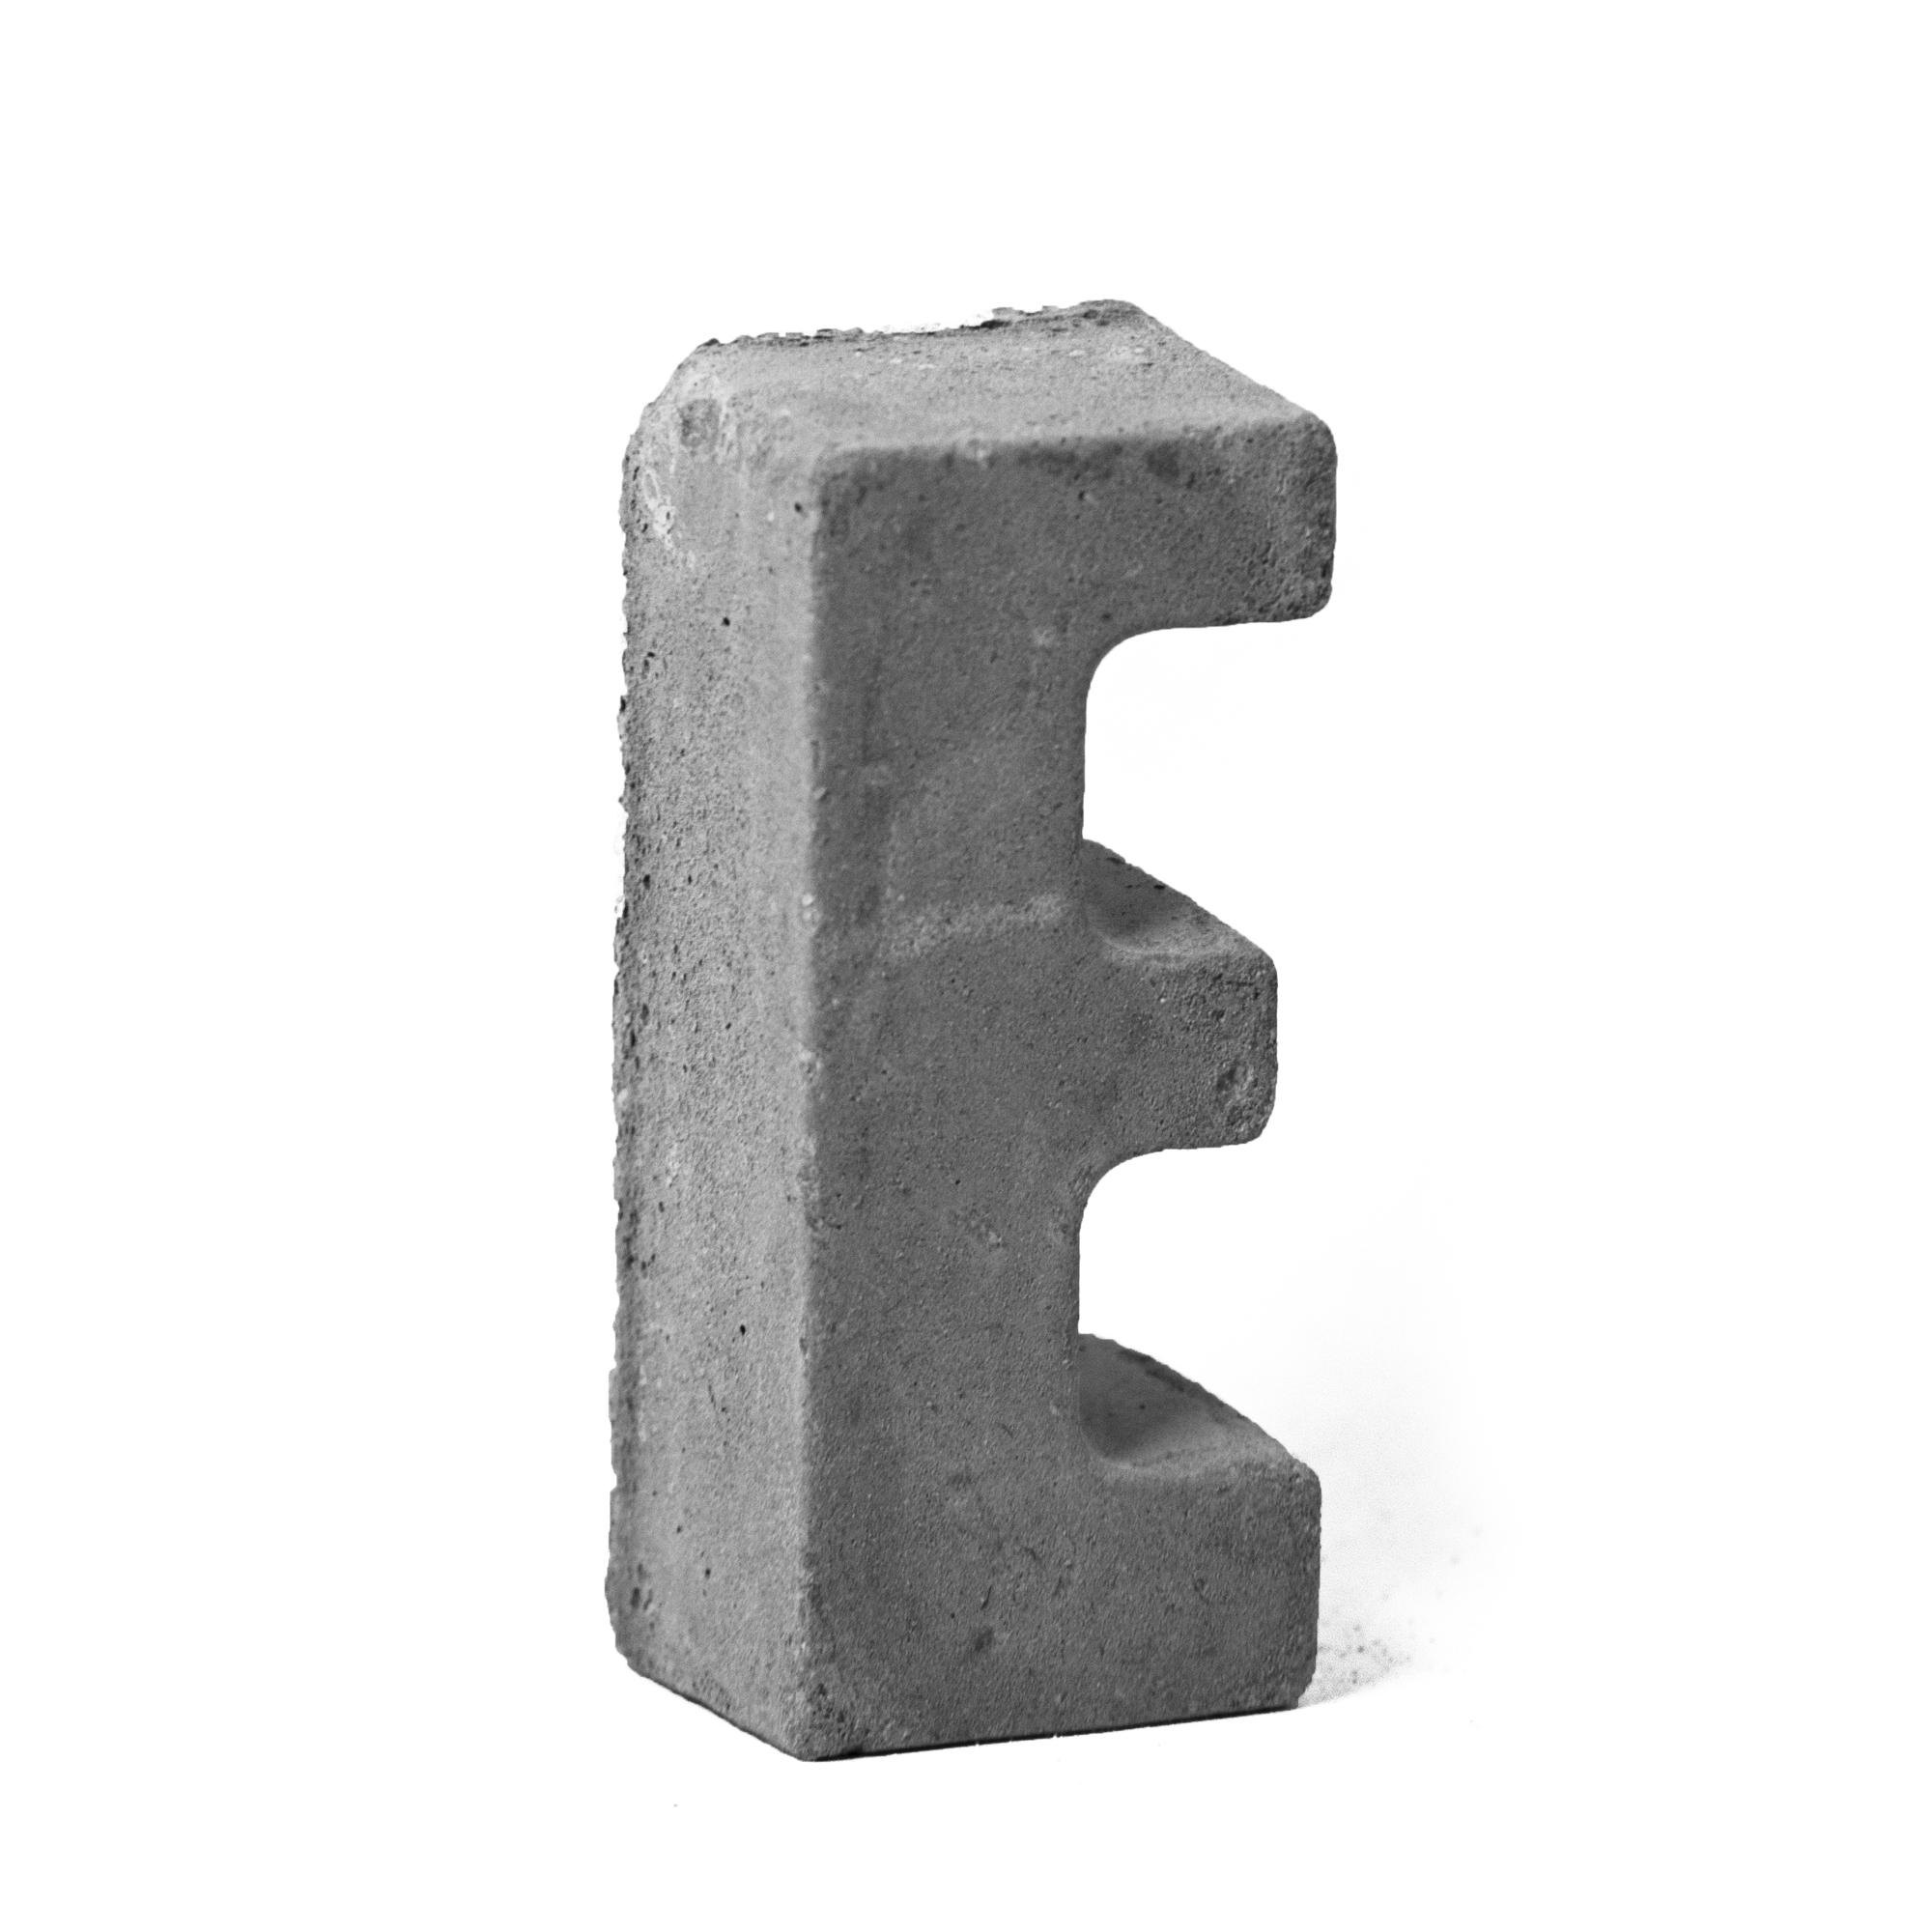 مجسمه بتنی طرح حروف مدل letter E